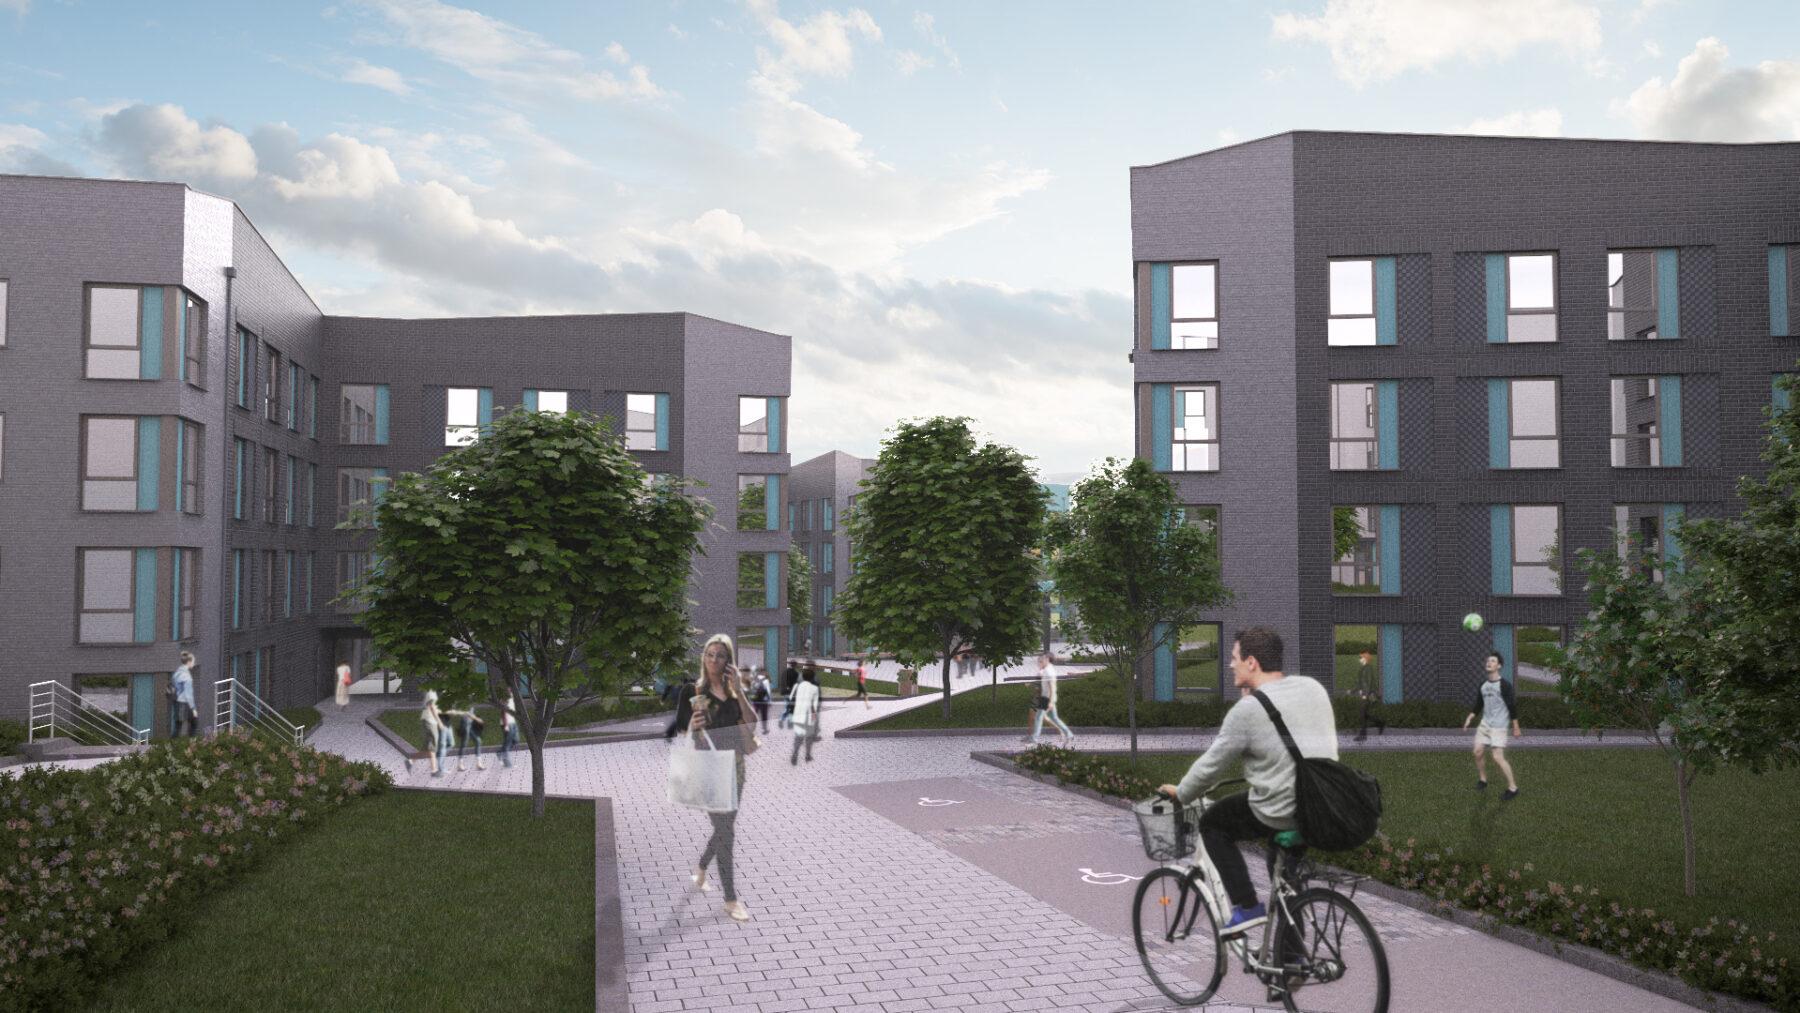 Mount Oswald New Residences - Durham University - Equitix - CLV - Interserve